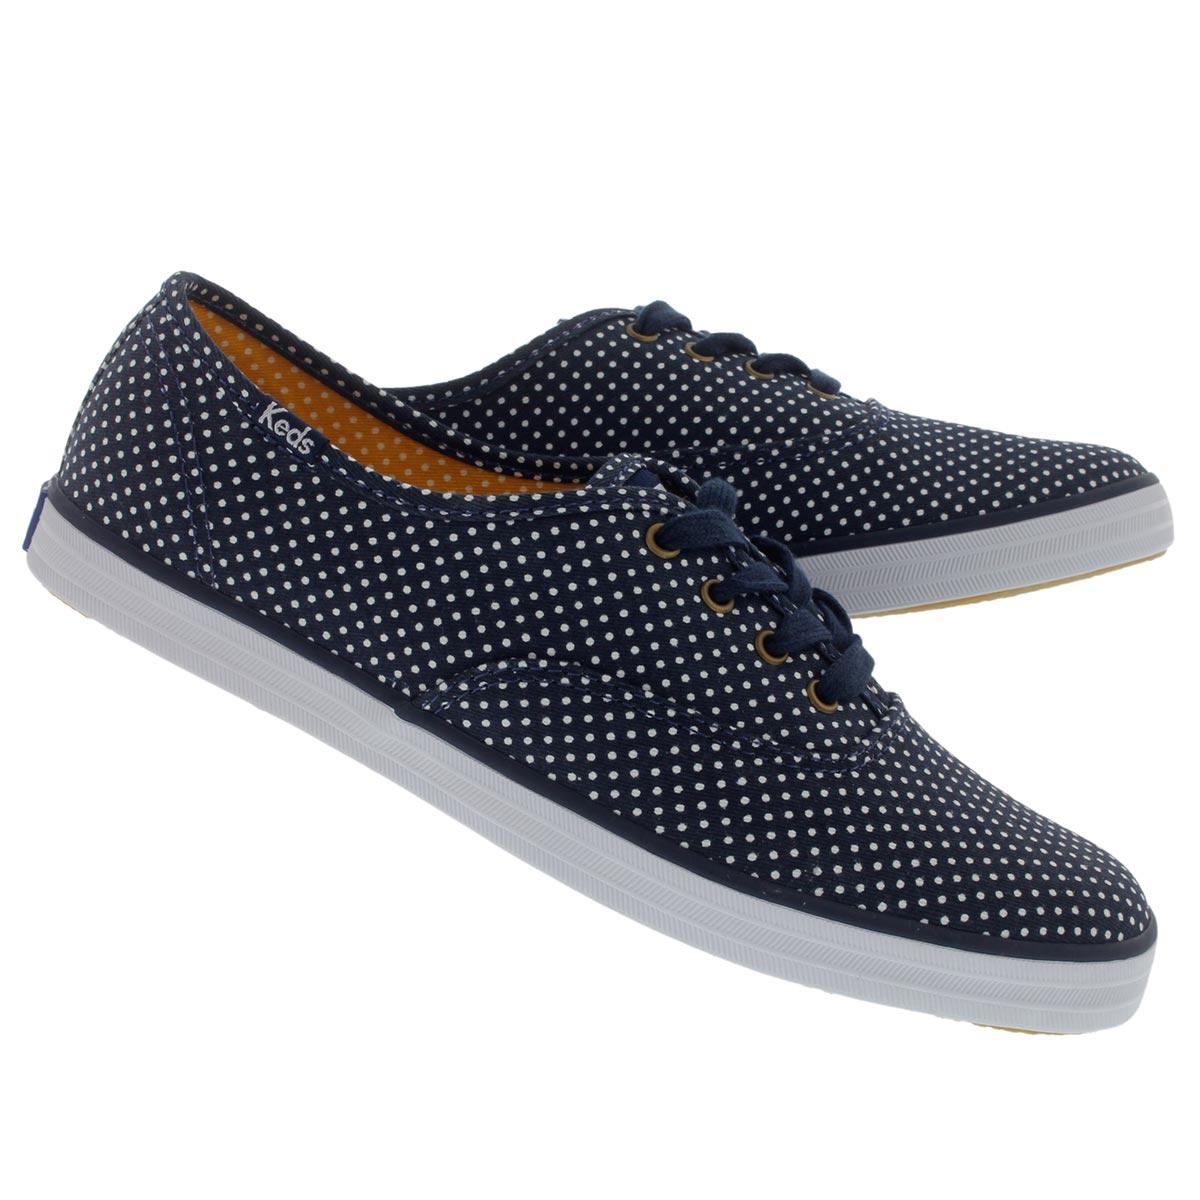 Lds Champion Micro Dot navy sneaker